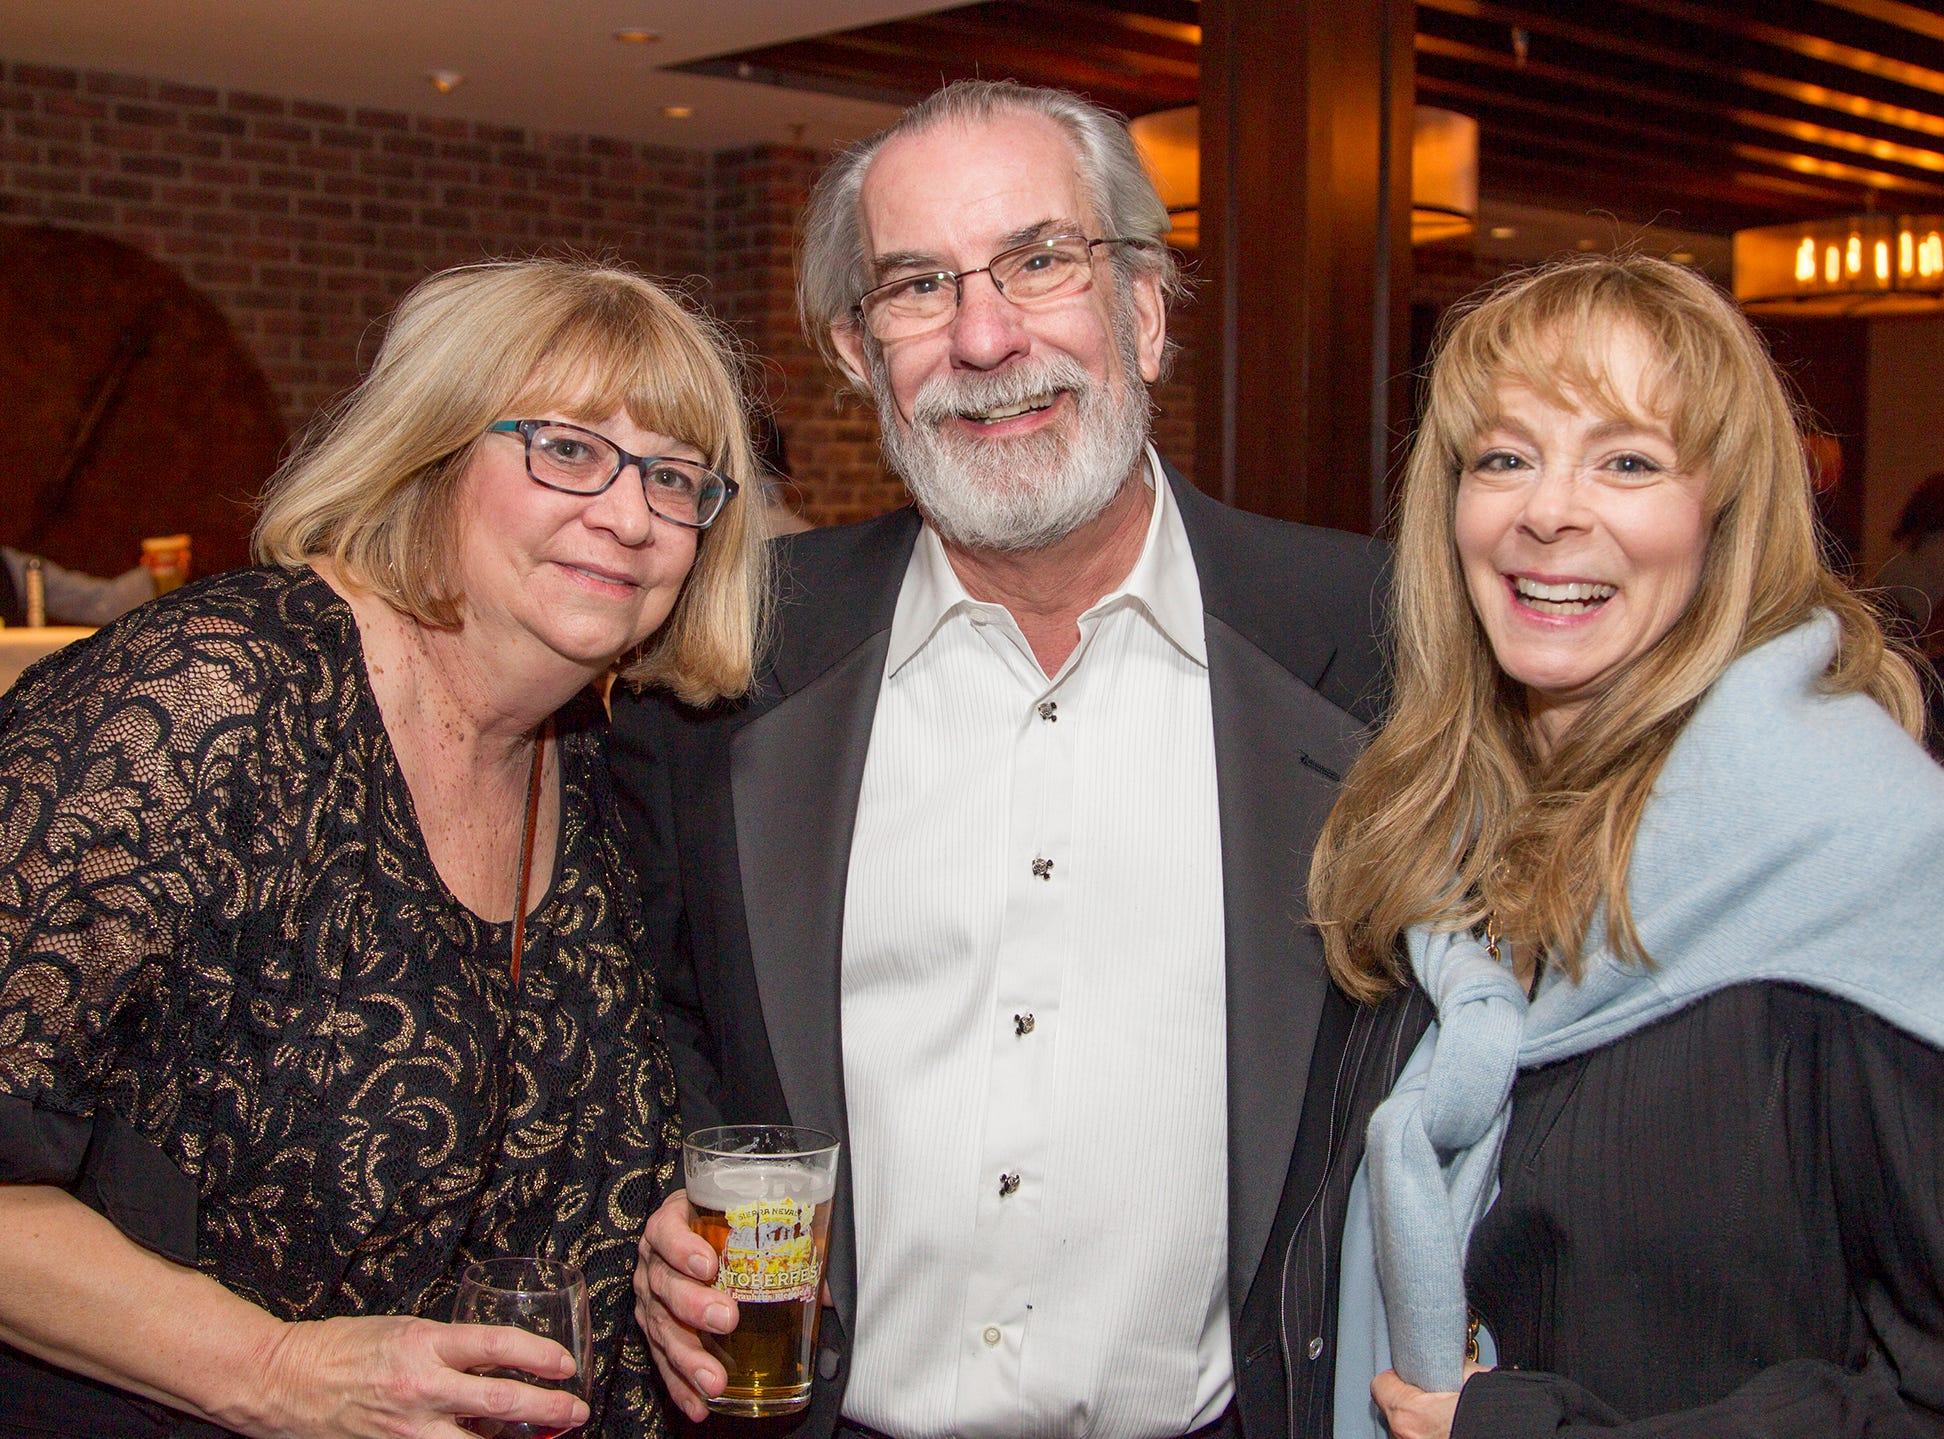 Nancy Eager, Wayne Angelbeck, Mindy Dauber. Ridgewood High School 2019 Jamboree after party at Park West Loft in Ridgewood.  2/9/2019